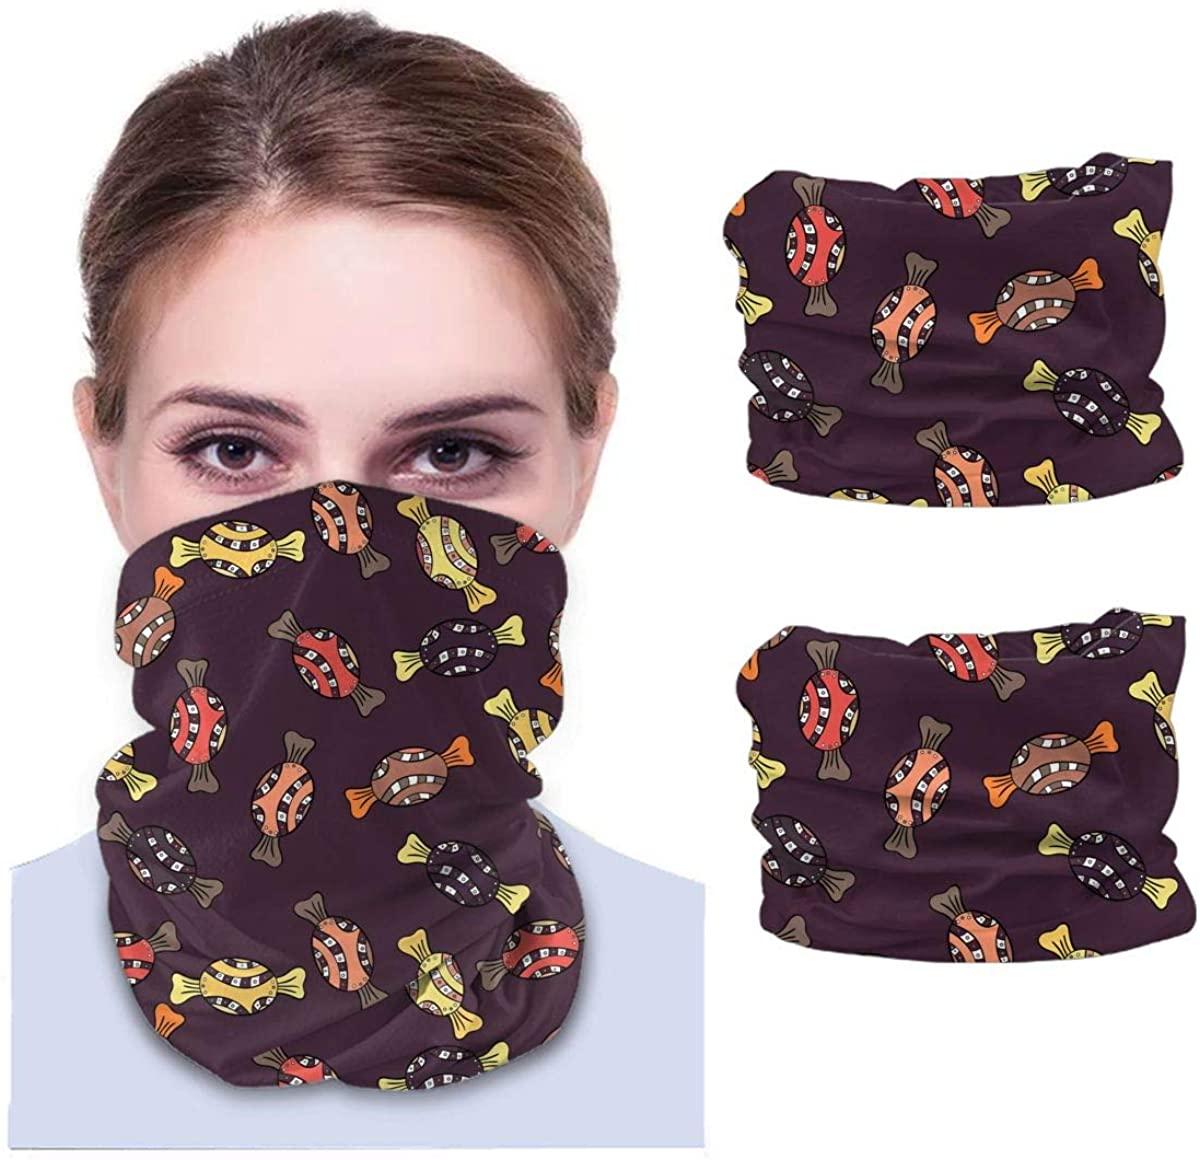 Pop Candy Funny Novelty Unisex Adult Face Mask 2 Pack Neck Gaiter Reusable Washable Windproof Mask Sports Outdoors Half Balaclava Ski Mask Bandana Women Men Gifts